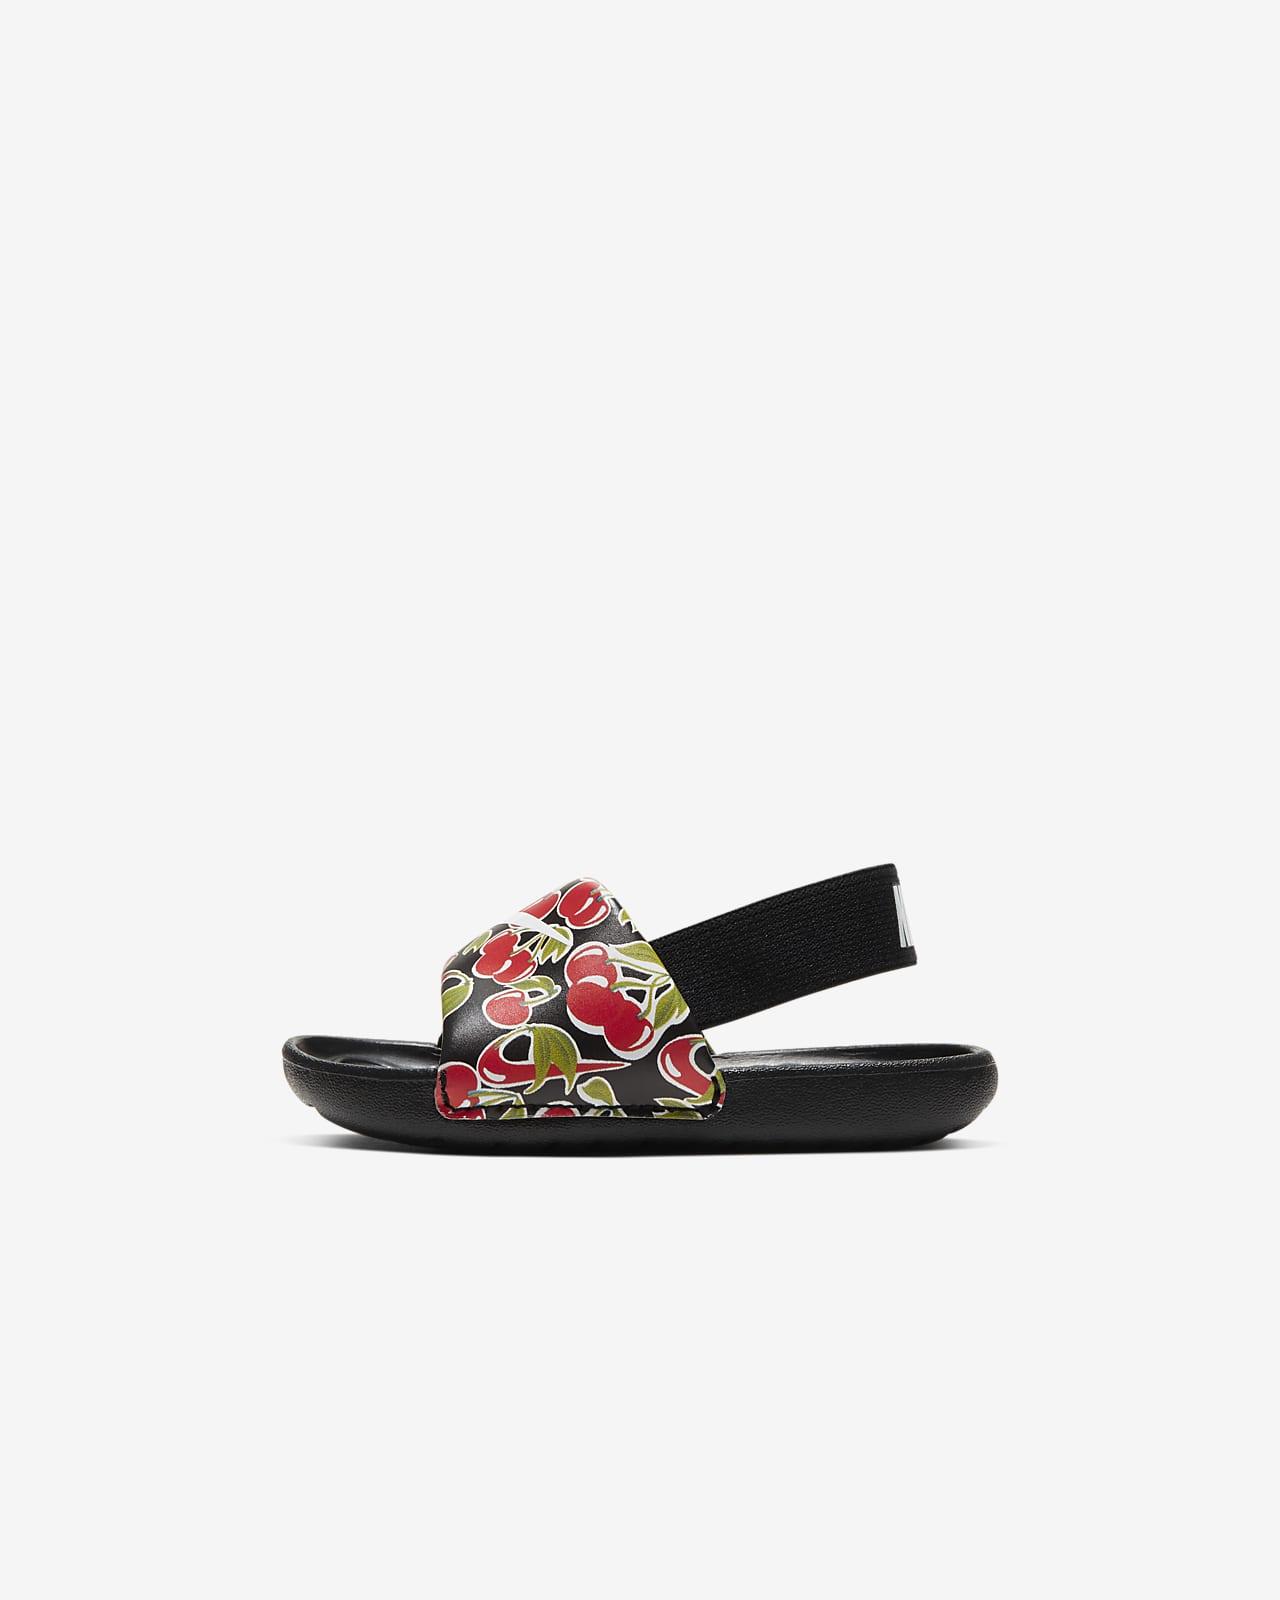 Nike Kawa SE Picnic Baby and Toddler Slide